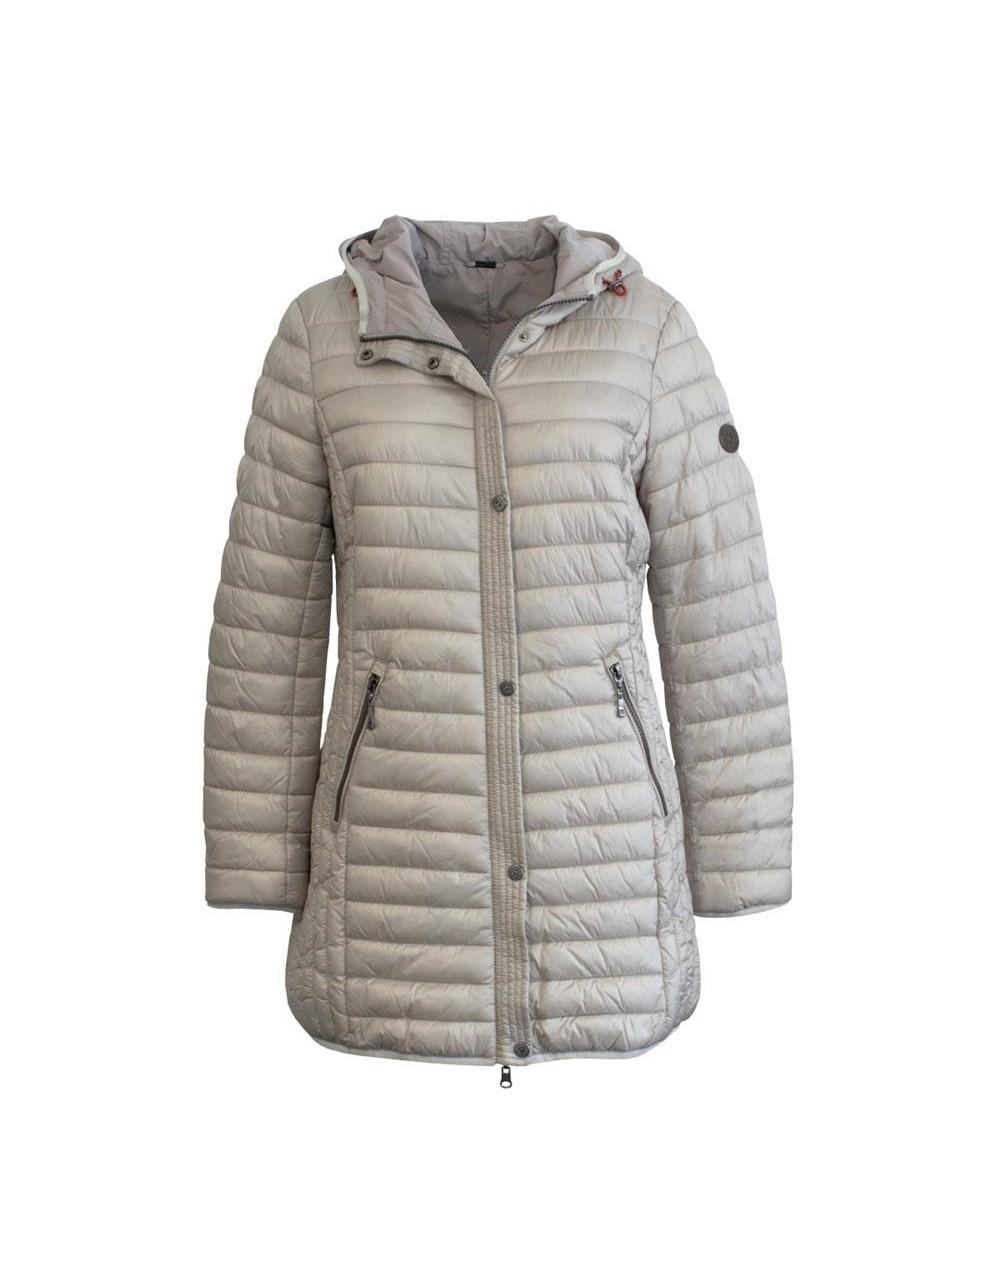 Barbara Lebek Reversible Long Jacket with Hood Outerwear Irish Handcrafts -1